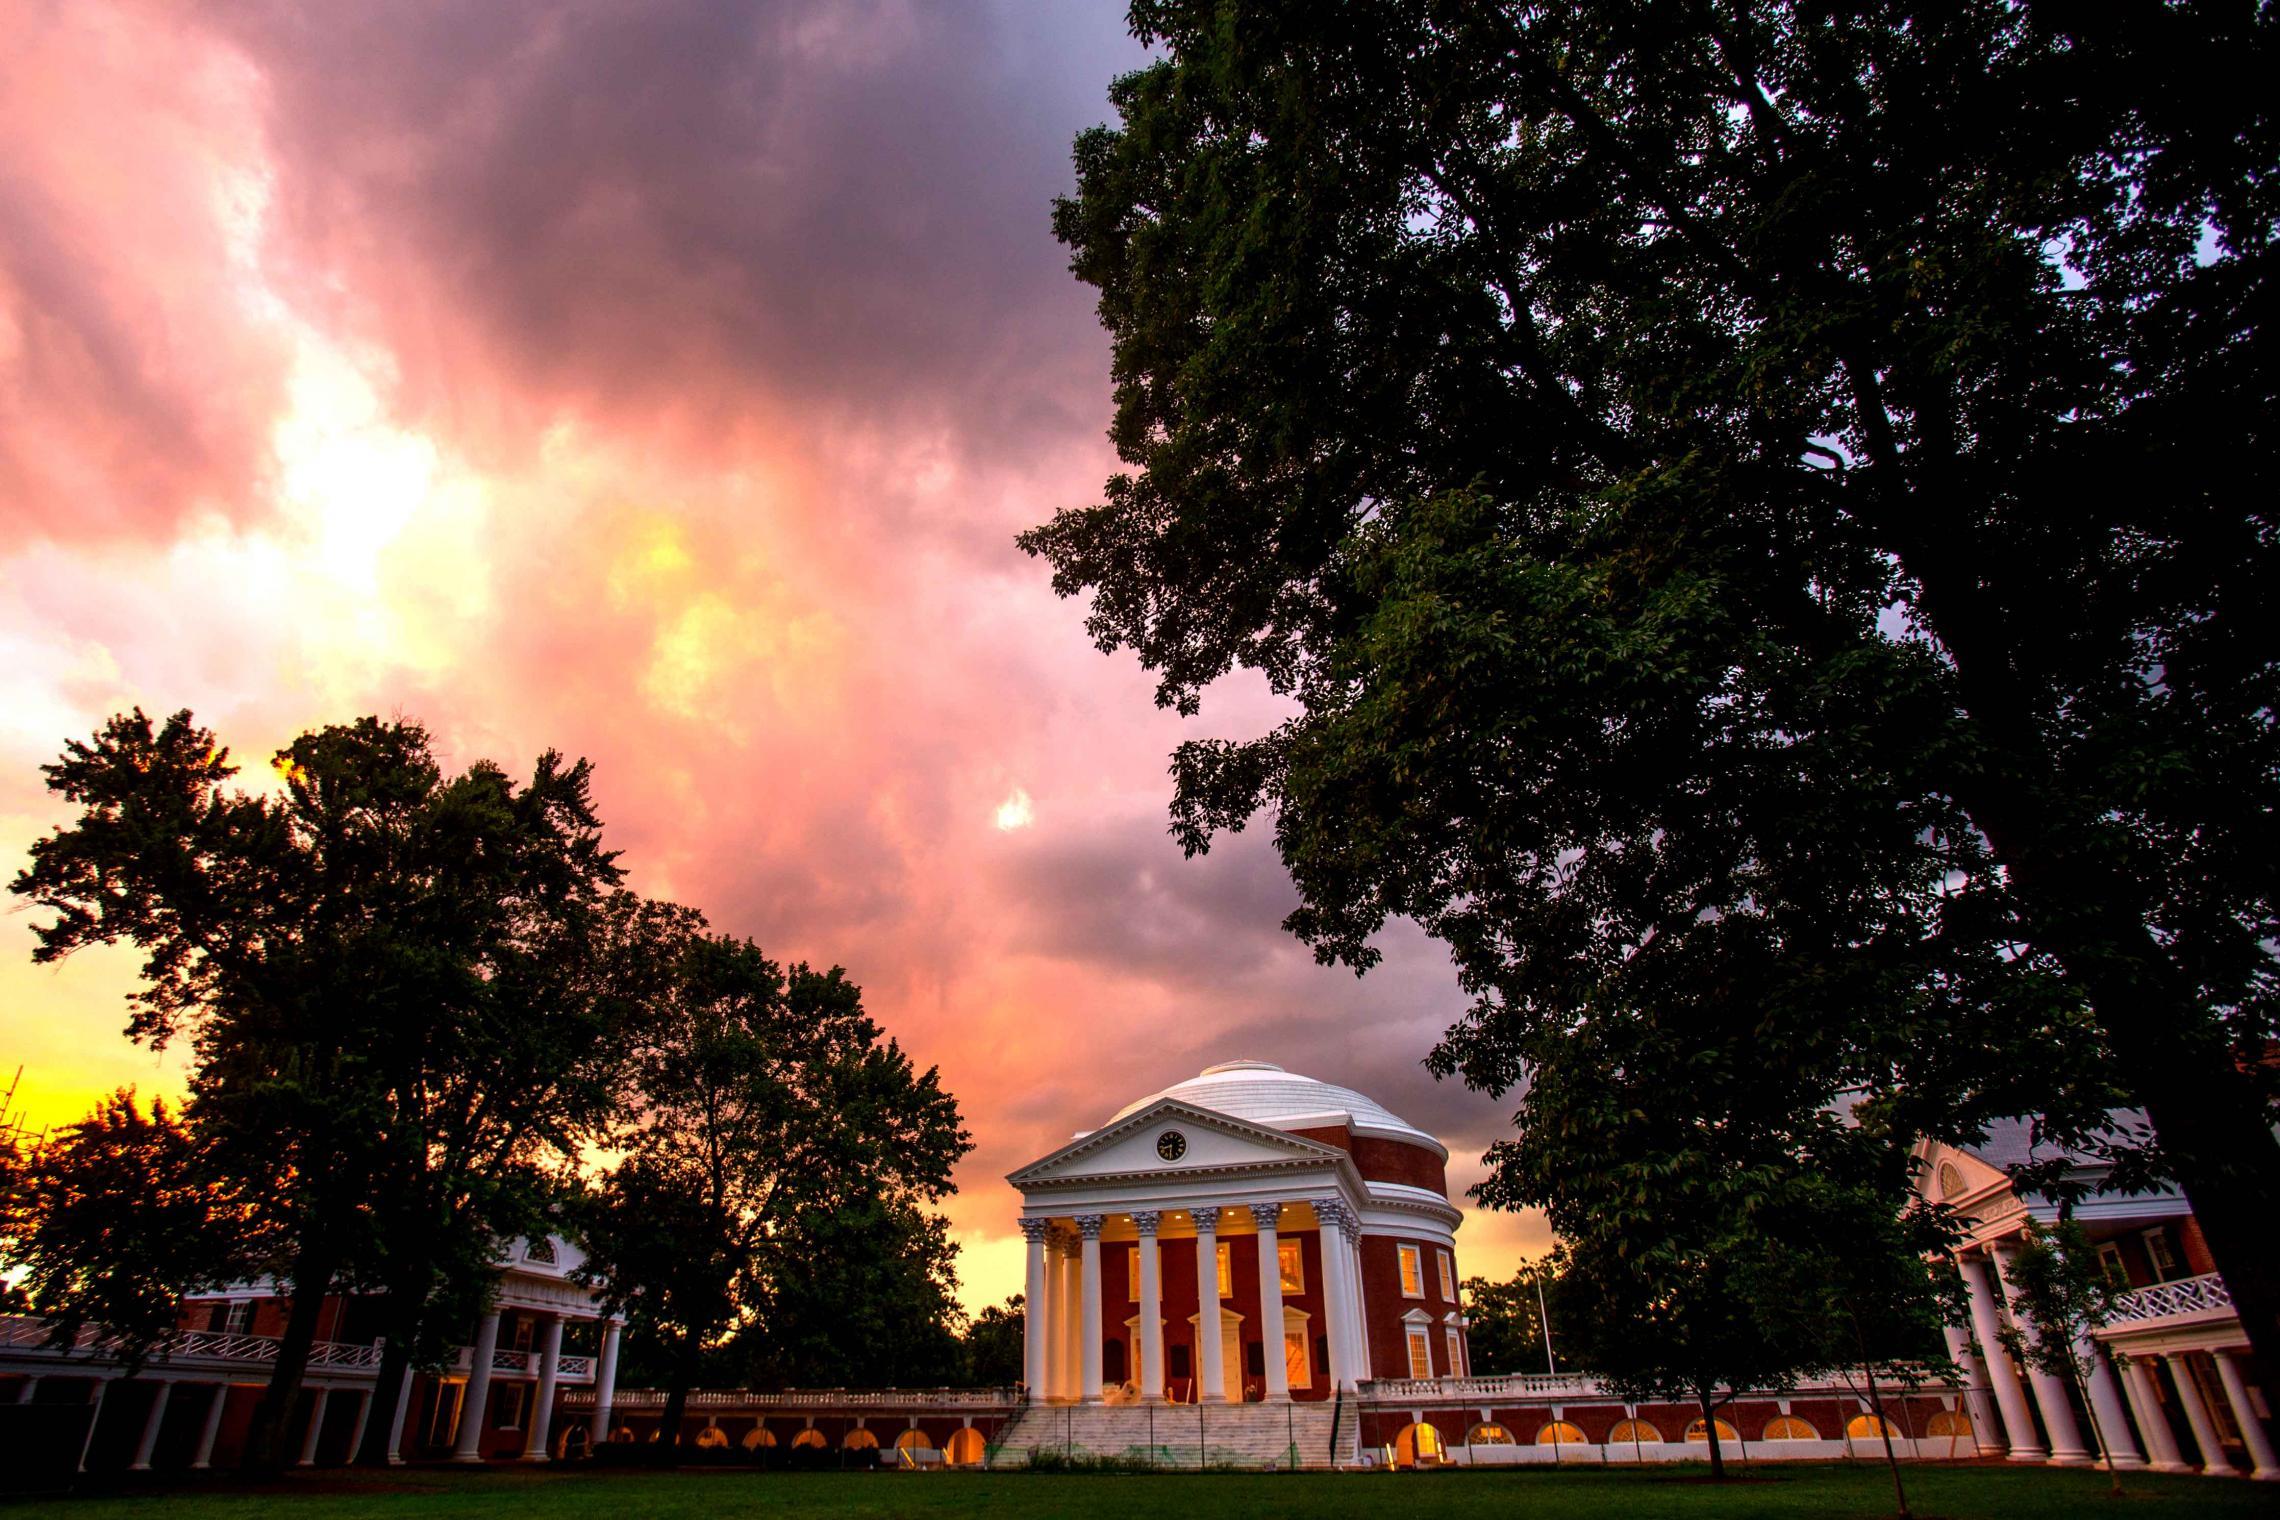 UVA's Rotunda (Photo by Sanjay Suchak, University Communications)